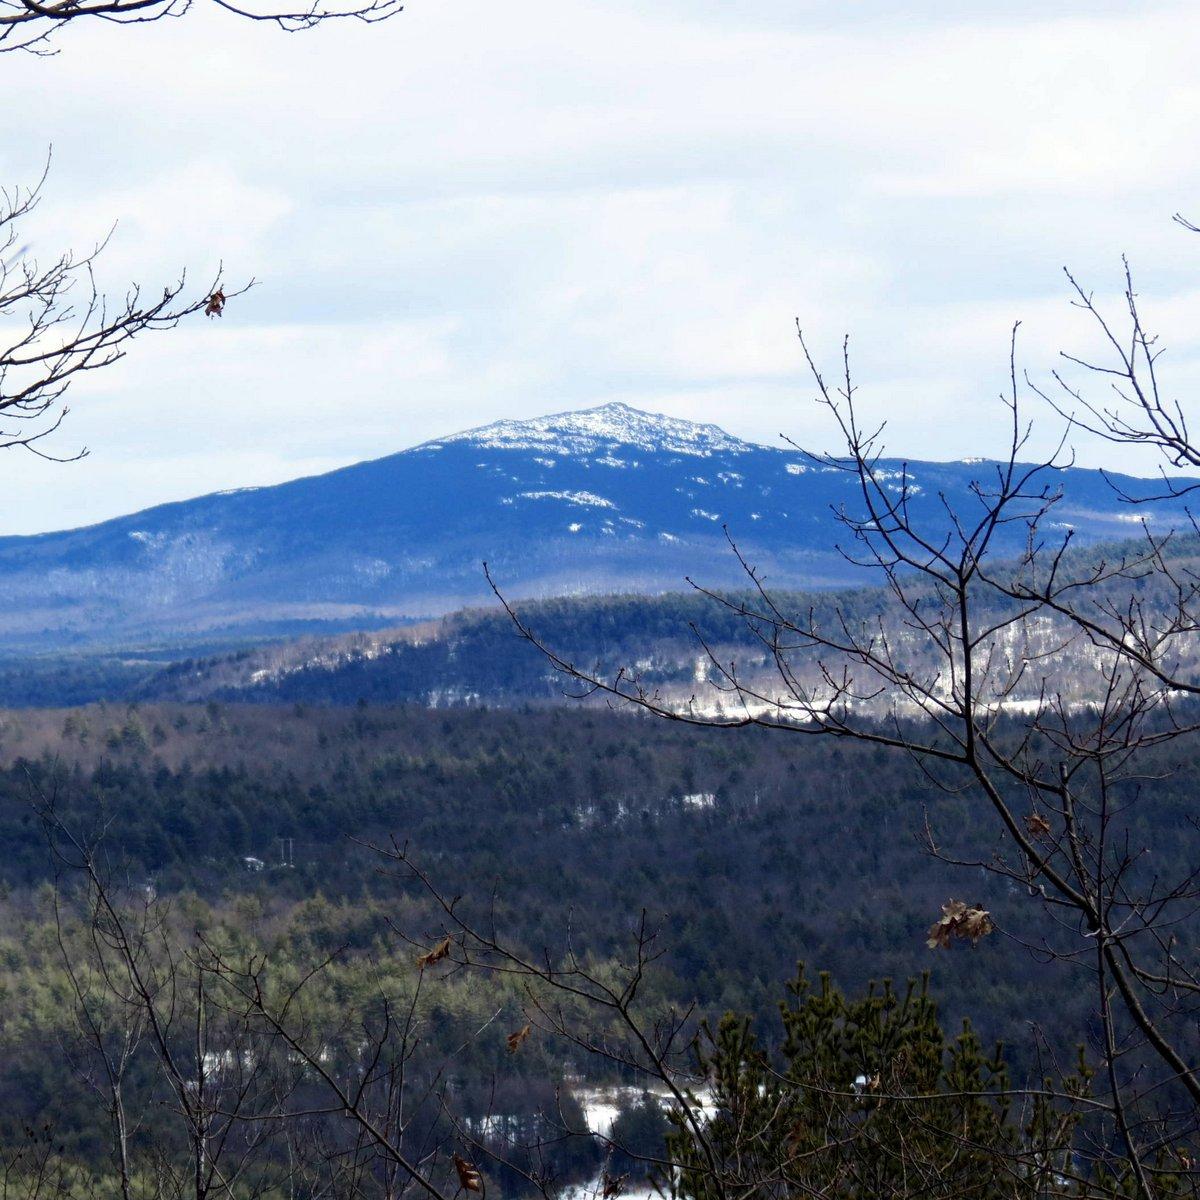 10. Mt. Monadnock from Mt. Caesar